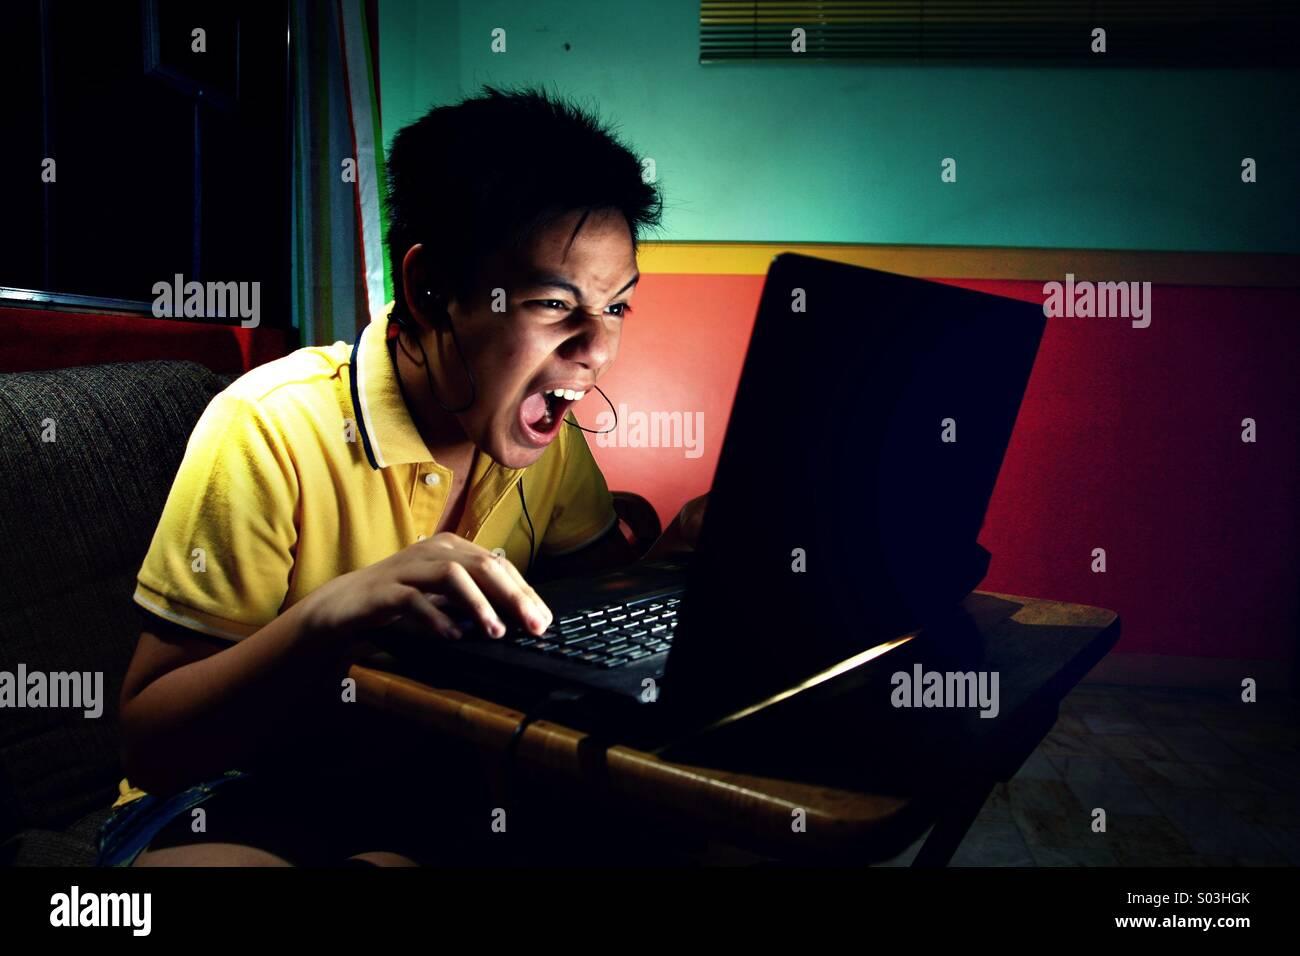 Jovencito asiático tocando intensamente en un ordenador portátil Imagen De Stock